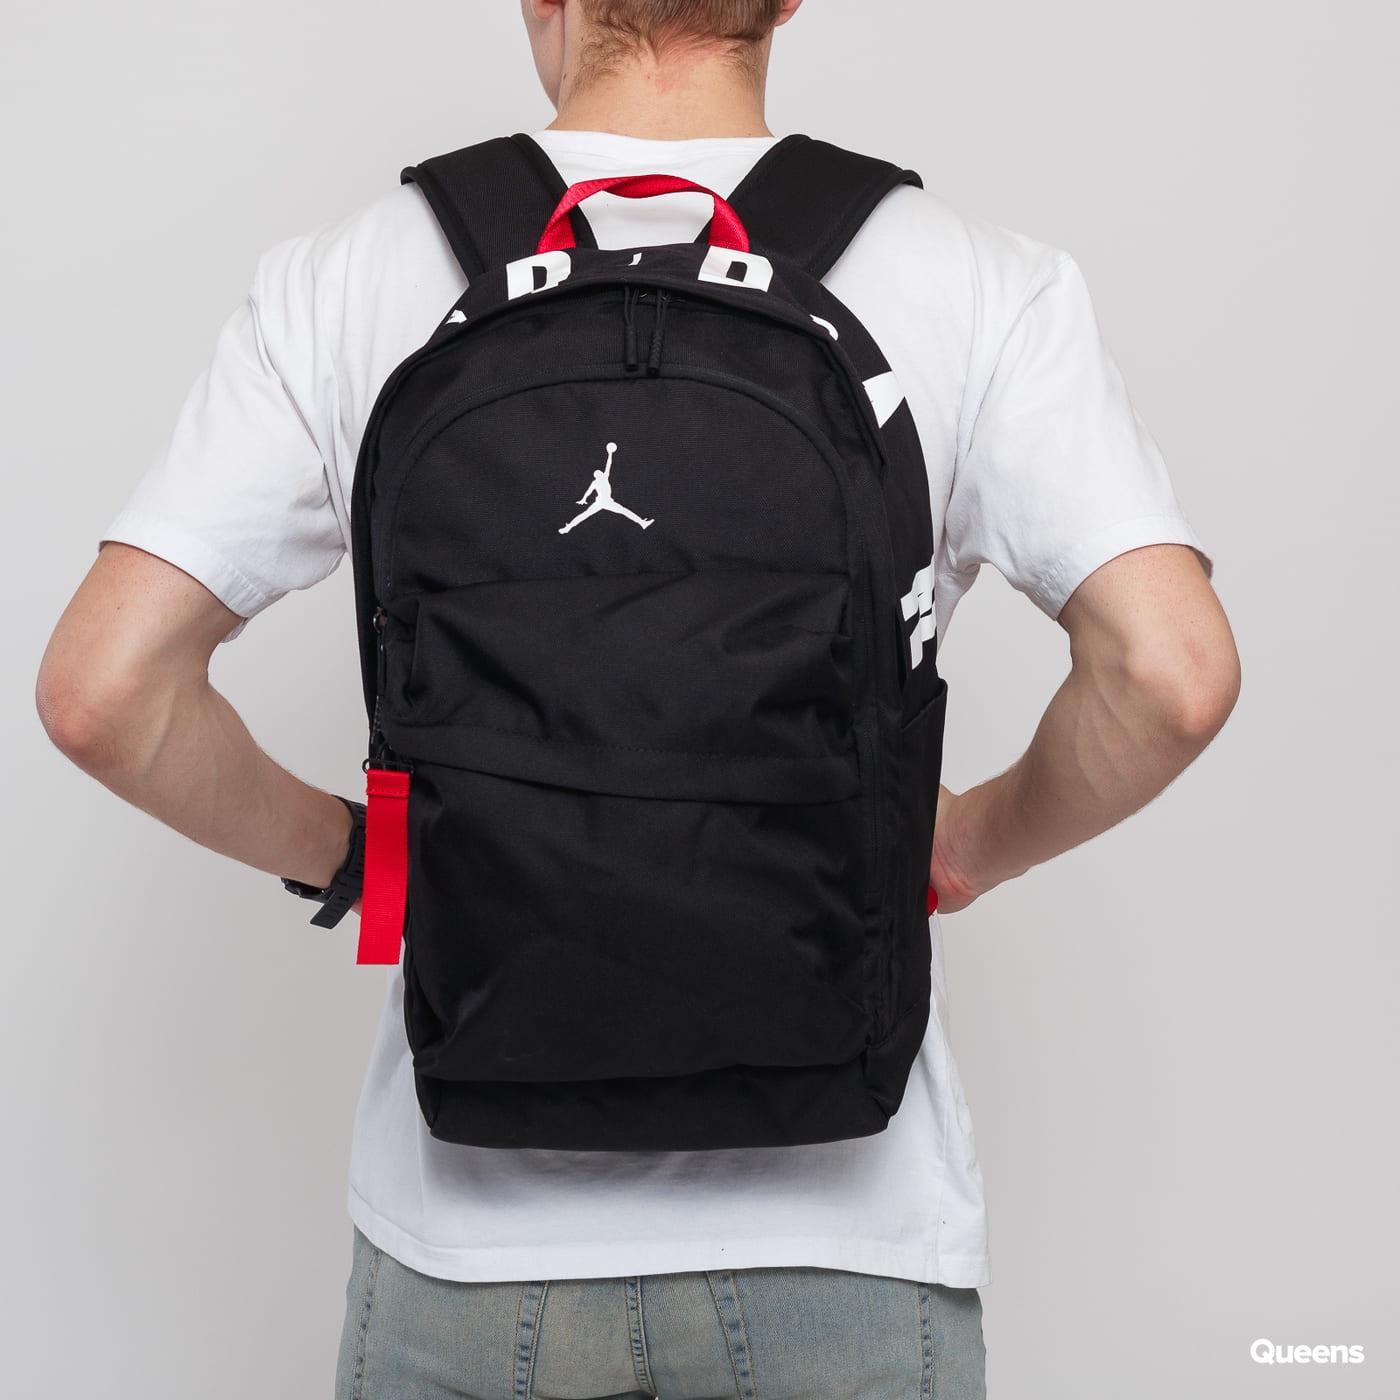 715aed567341 Zoom in Zoom in Zoom in Zoom in Zoom in Zoom in. Jordan Air Patrol Backpack  ...